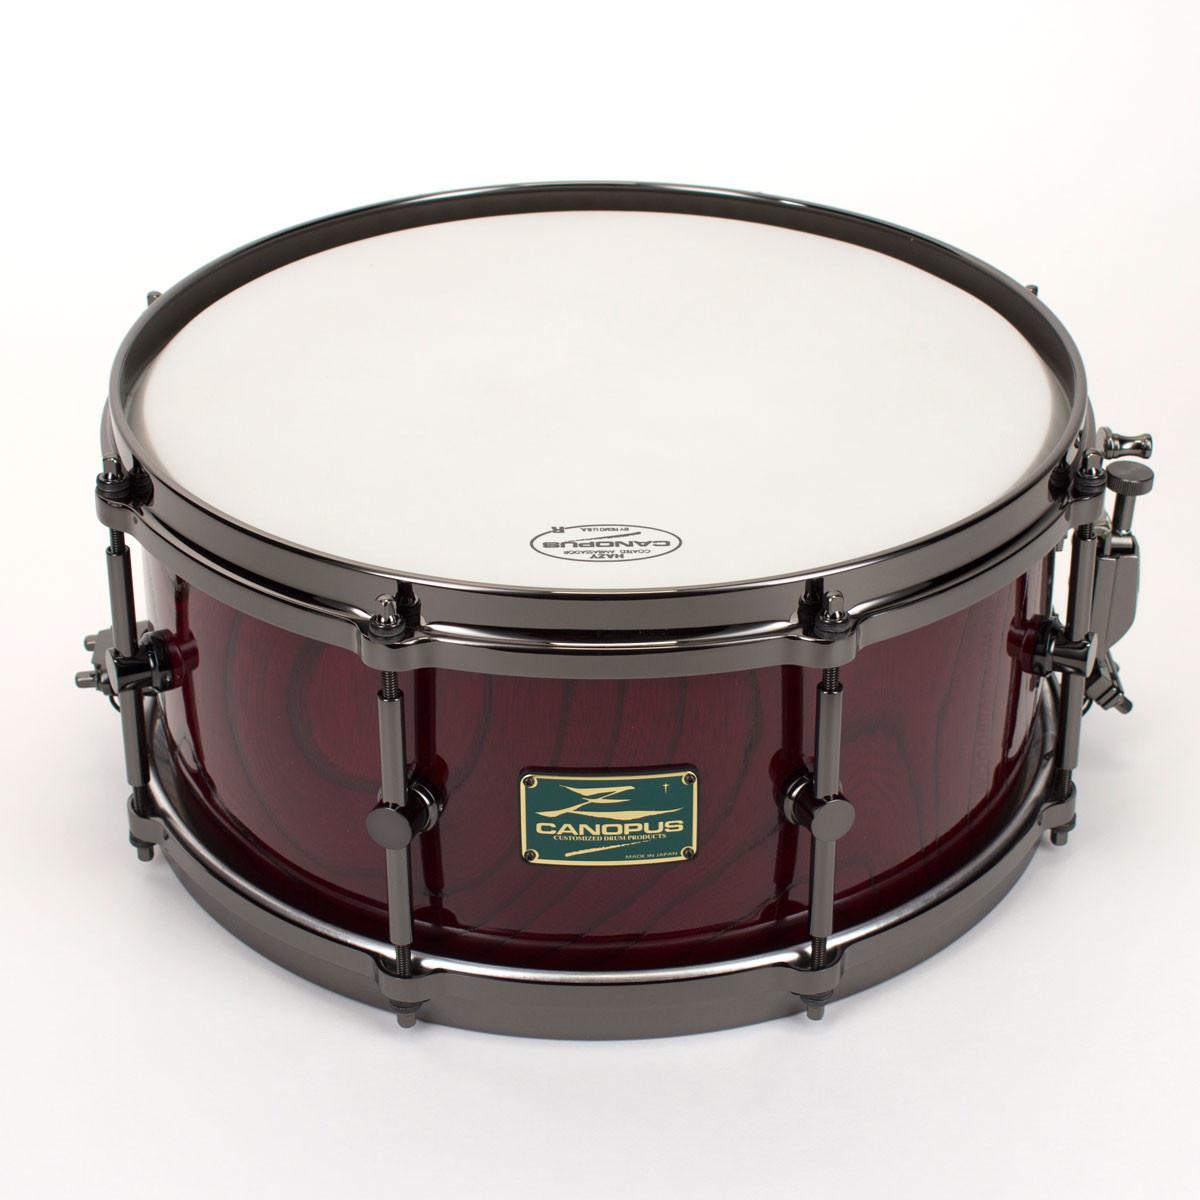 canopus zelkova 14 x 6 5 snare drum limited serie 2013 lacquer hs 1465ki vintage brian blade. Black Bedroom Furniture Sets. Home Design Ideas